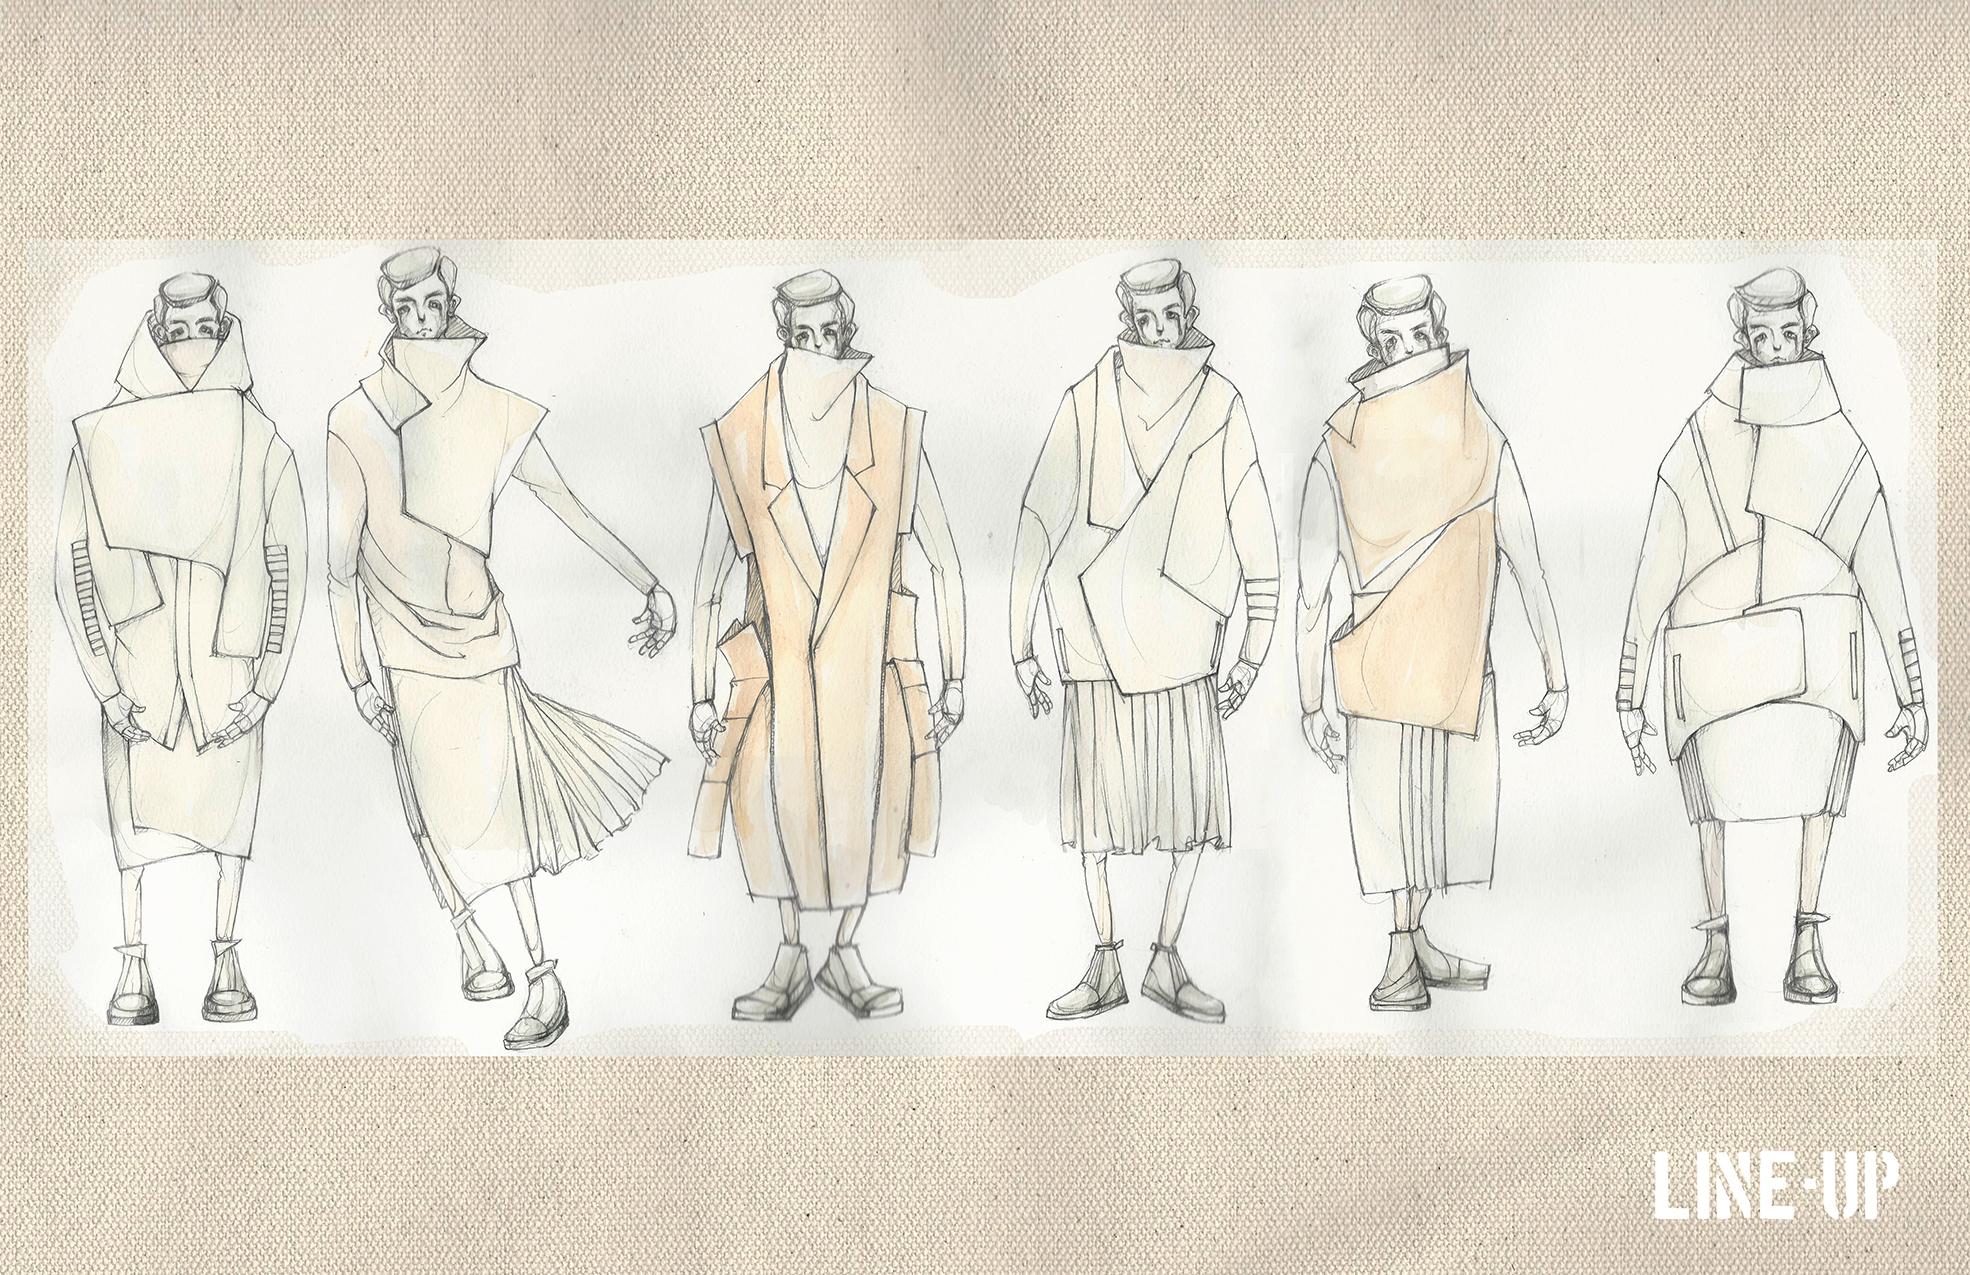 Ruone-Yan-Illustrated-Lineup